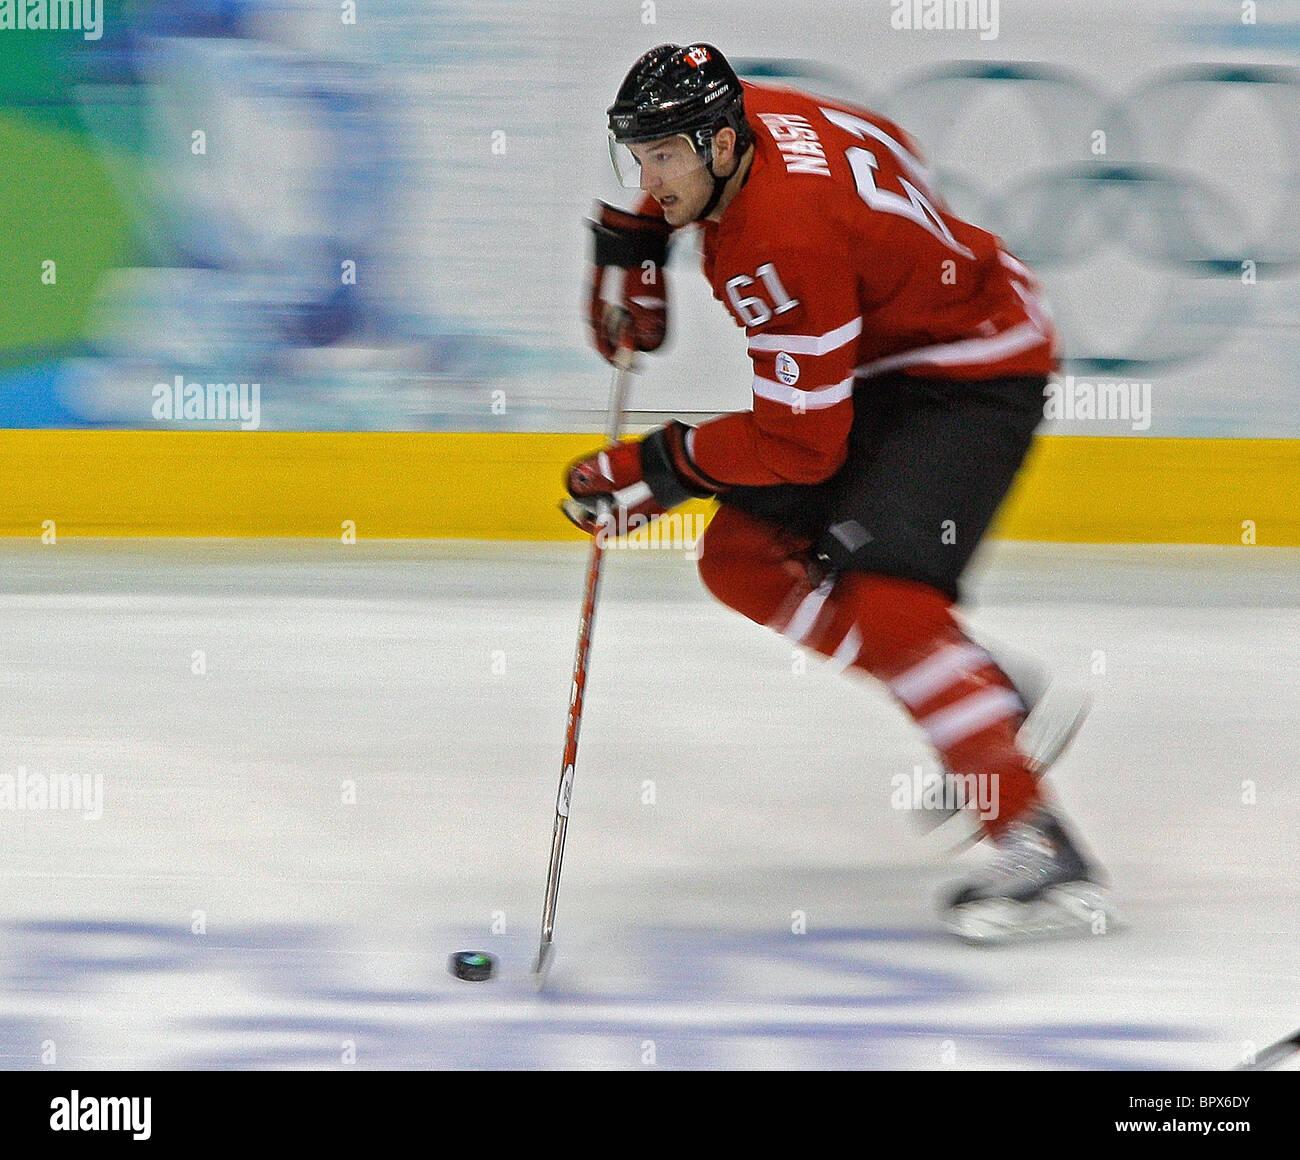 Vancouver 2010: Men's ice hockey - Canadá 3 - 5 EE.UU. Imagen De Stock